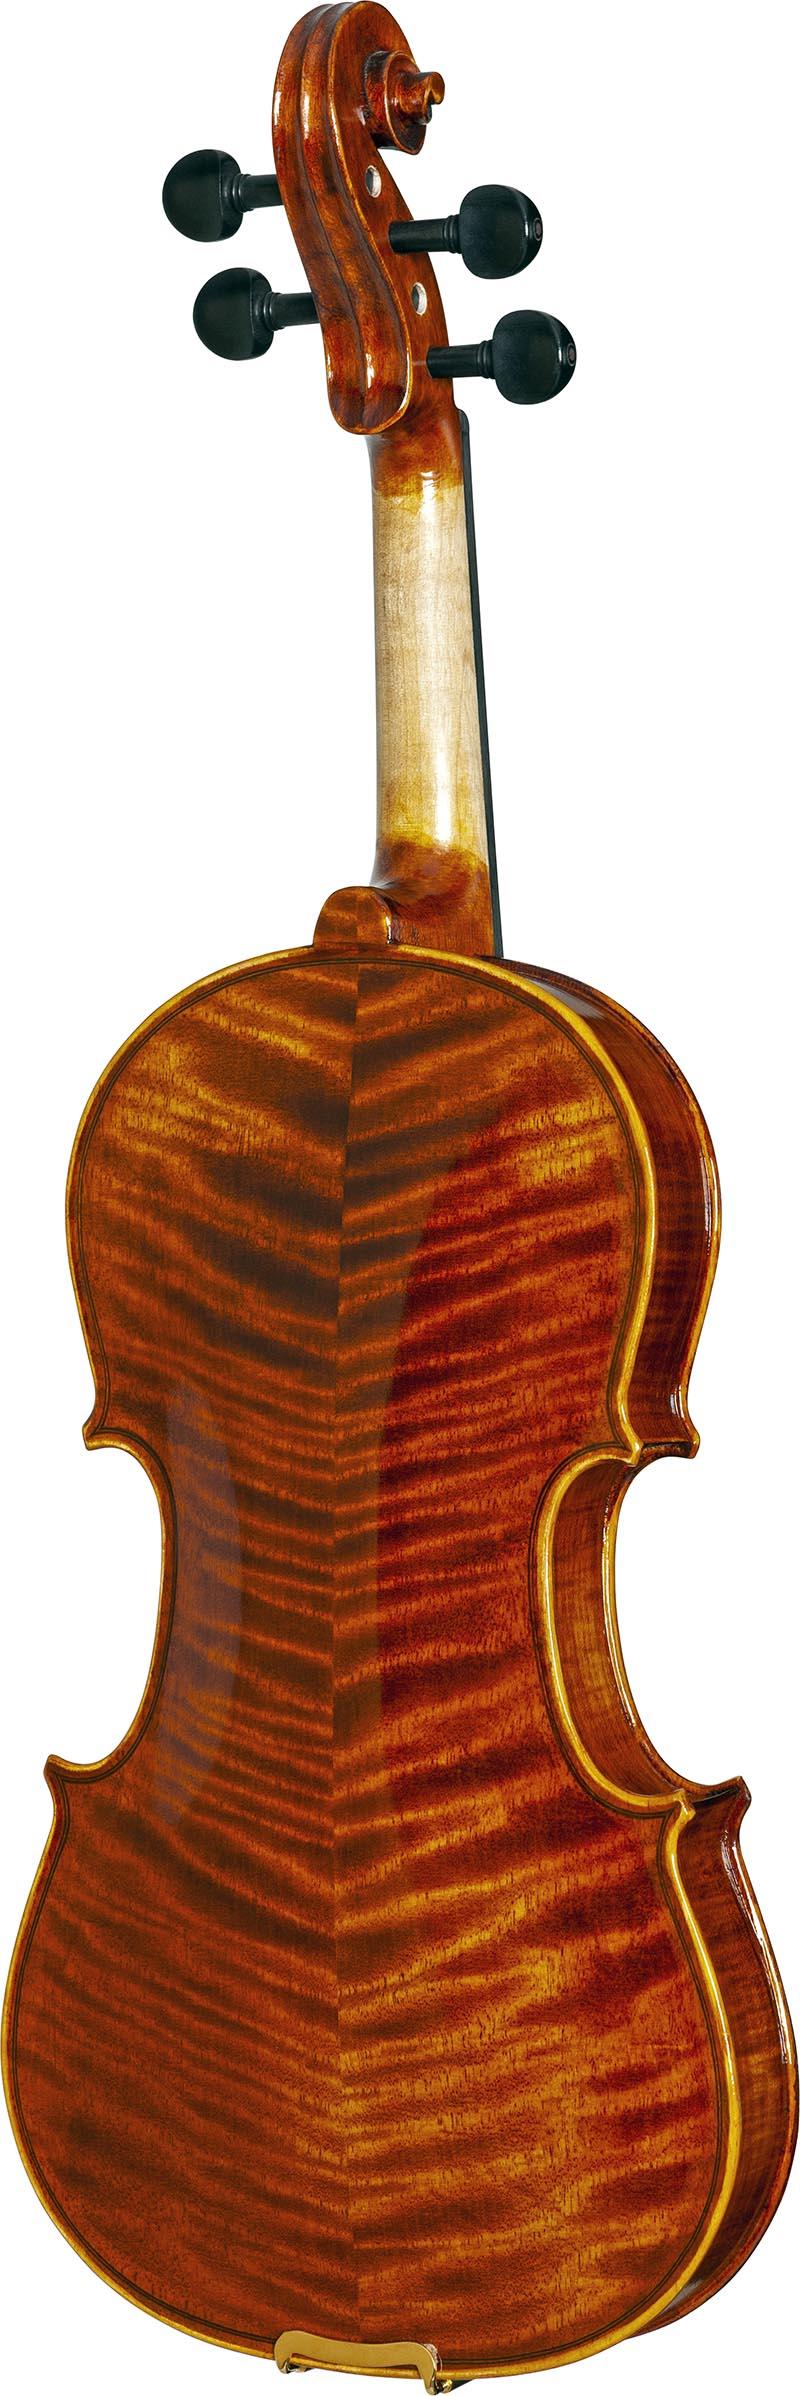 vk644 violino eagle vk644 visao posterior vertical